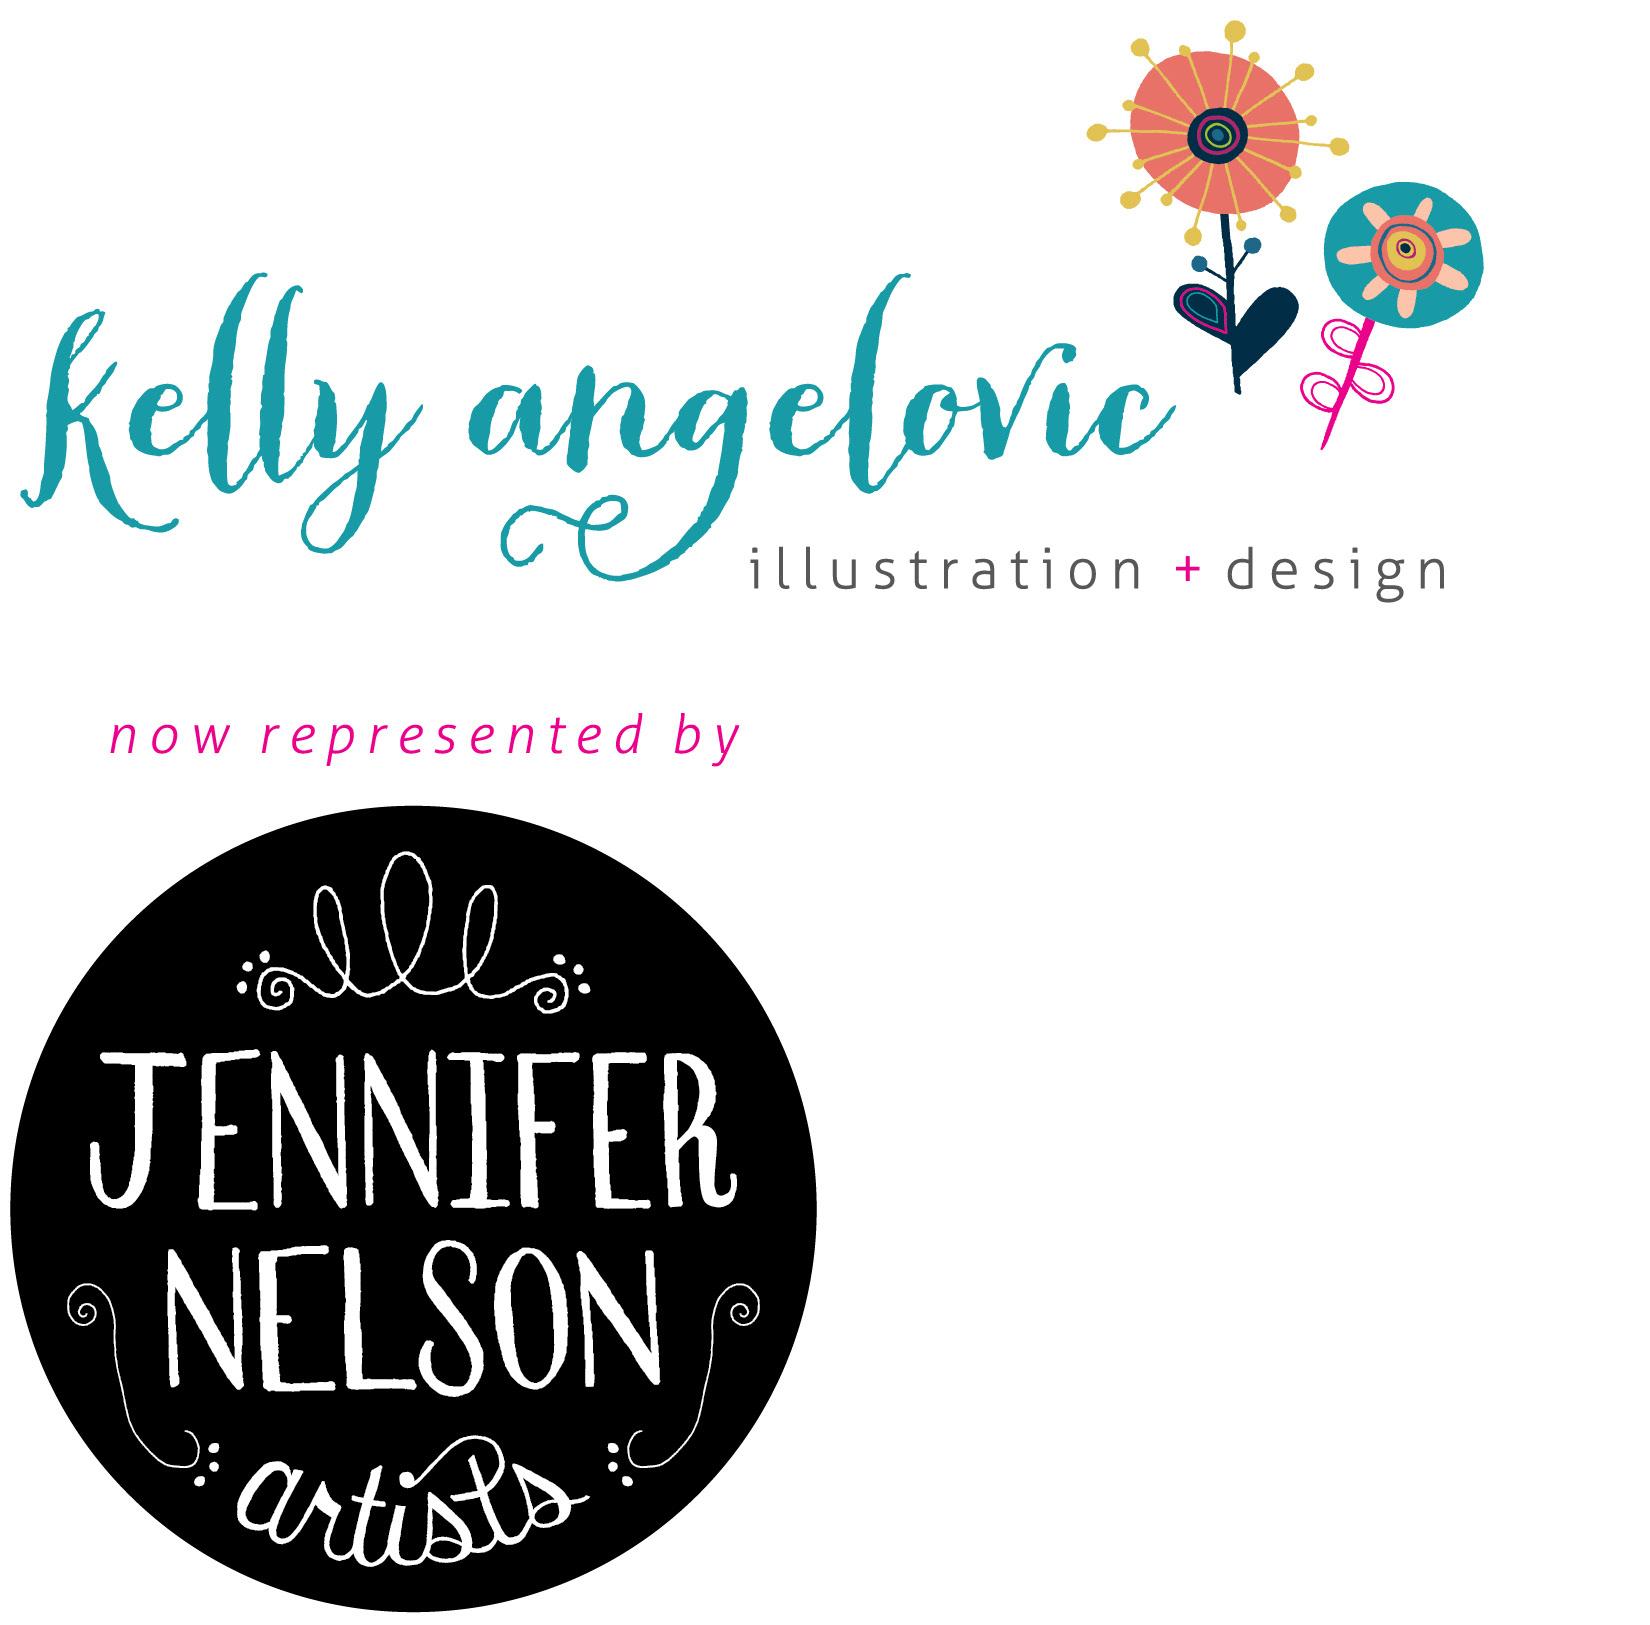 Kelly Angelovic Illustration + Design